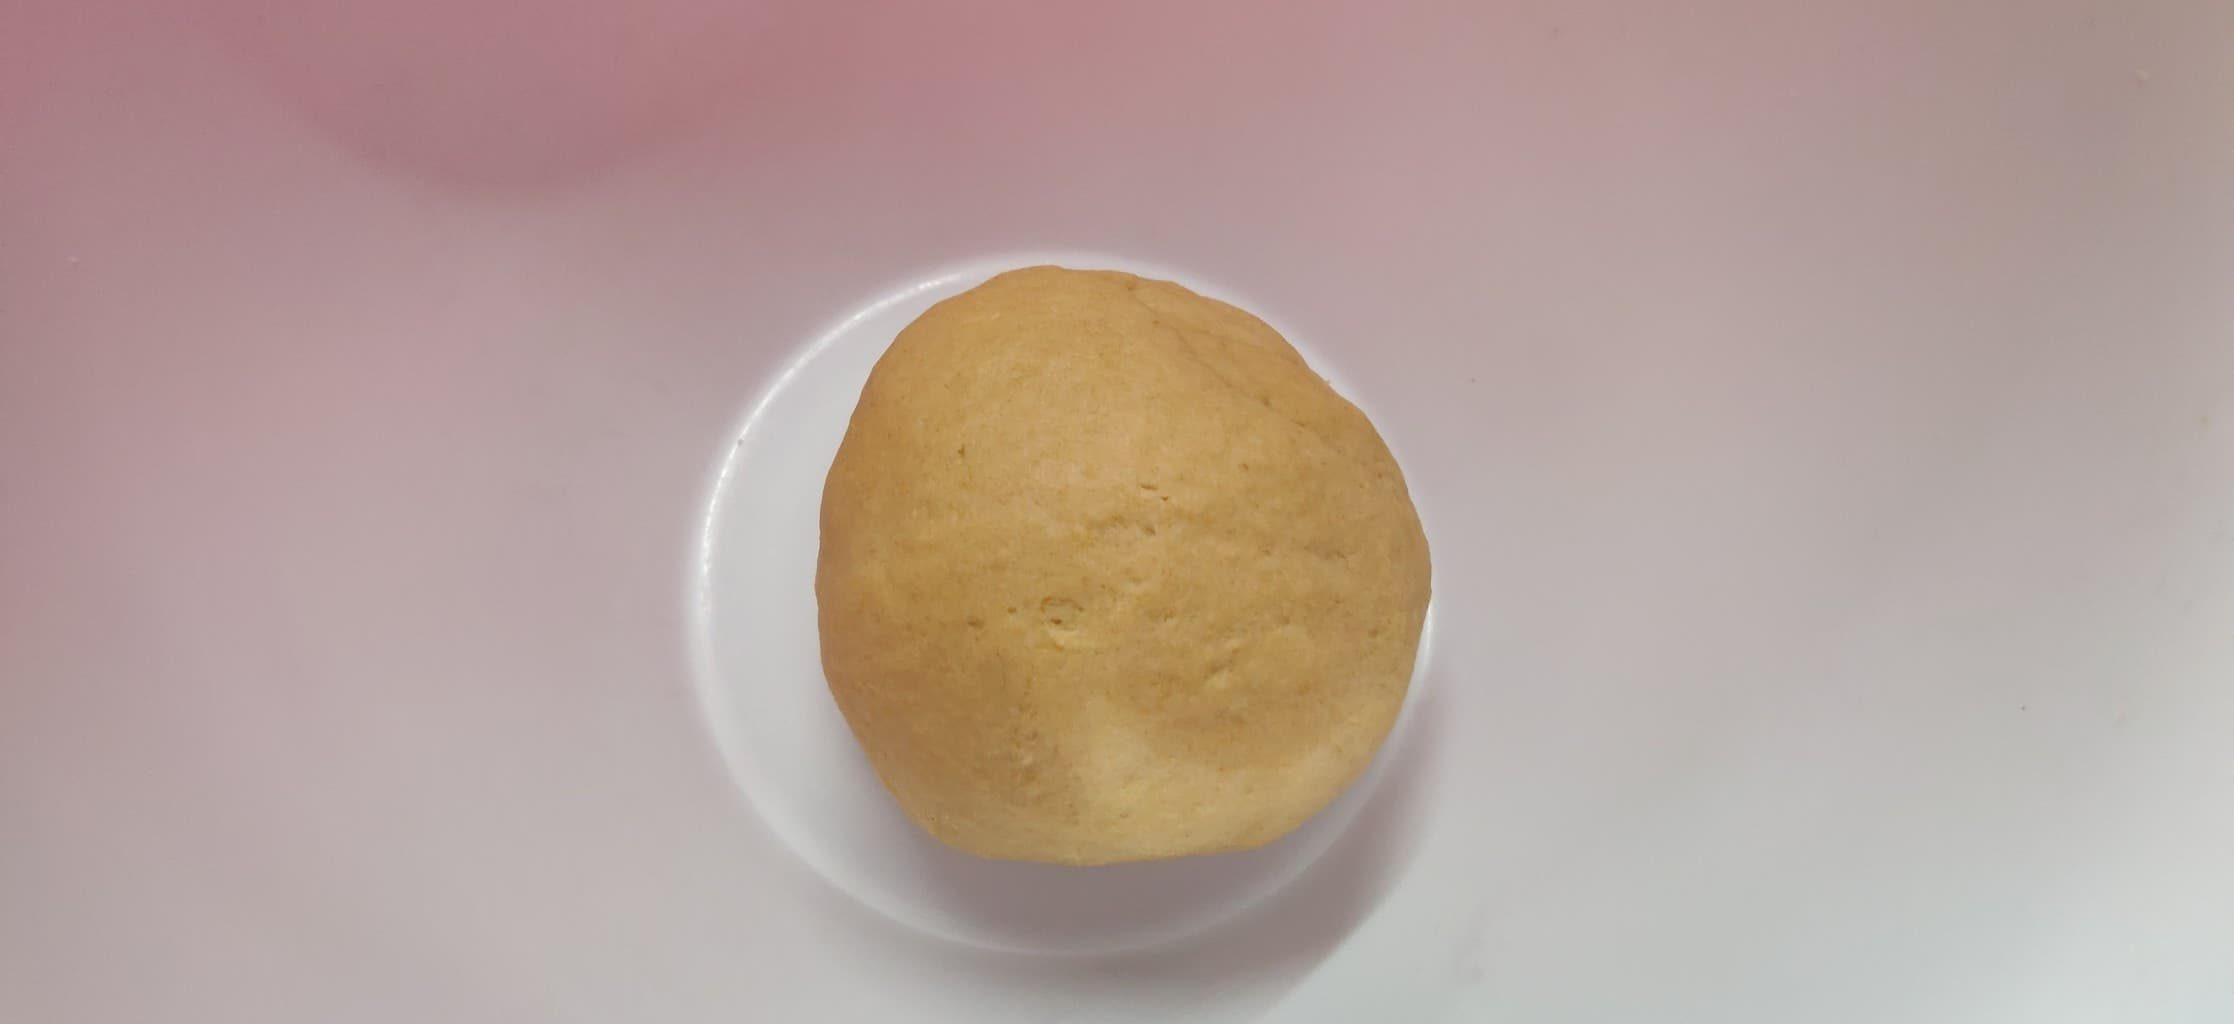 chocolate_swirl_buns - 68482821_866986990355221_1353263136051822592_n.jpg